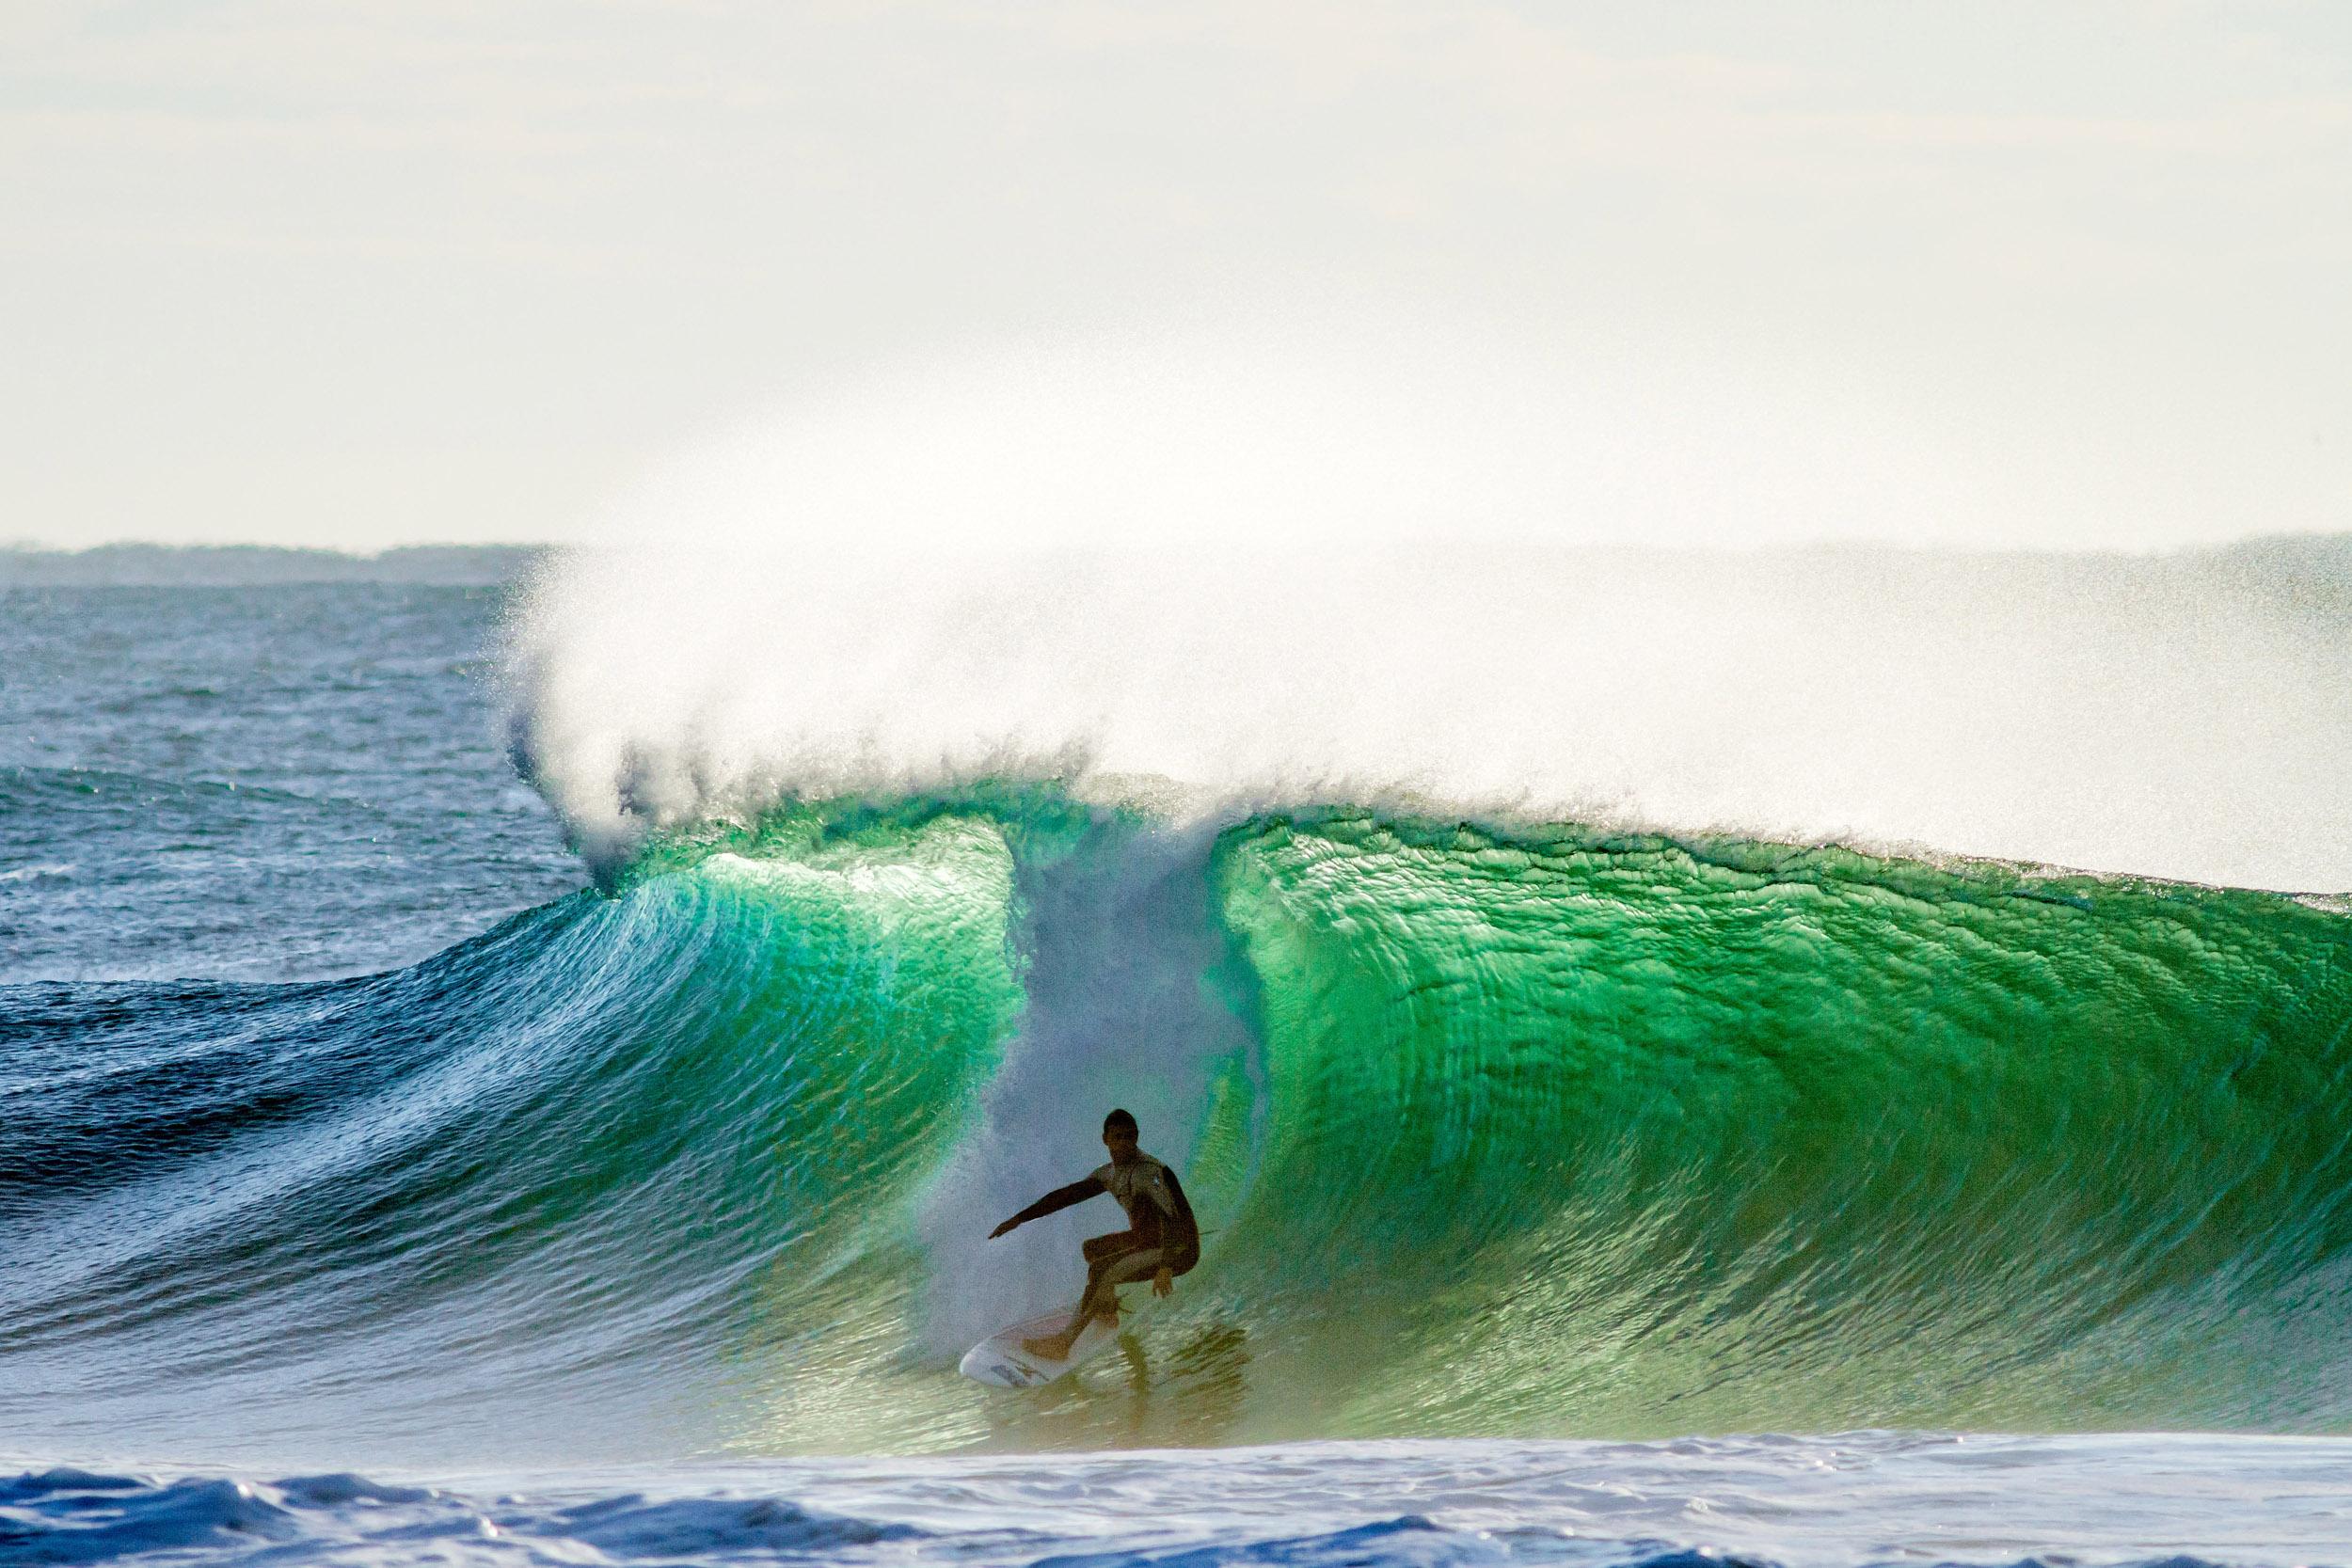 solo-surfing-trent-S1141-198.jpg